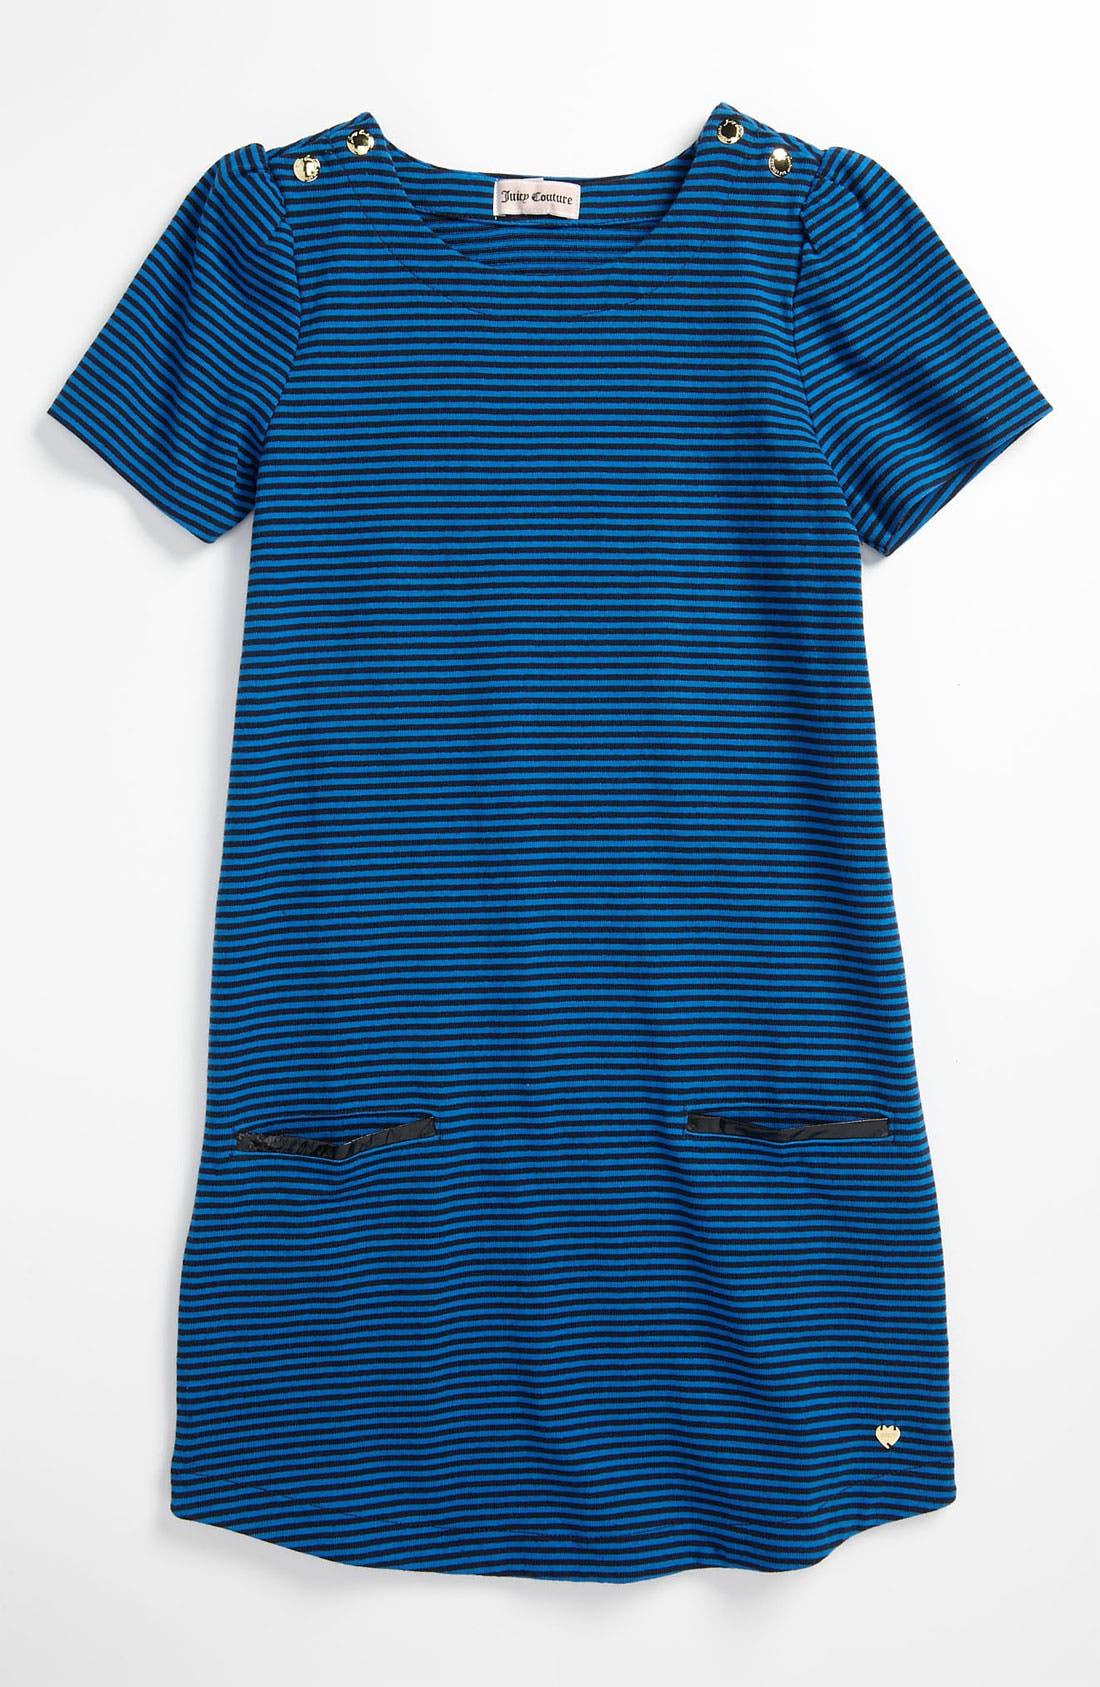 Main Image - Juicy Couture Stripe Jersey Dress (Little Girls & Big Girls)